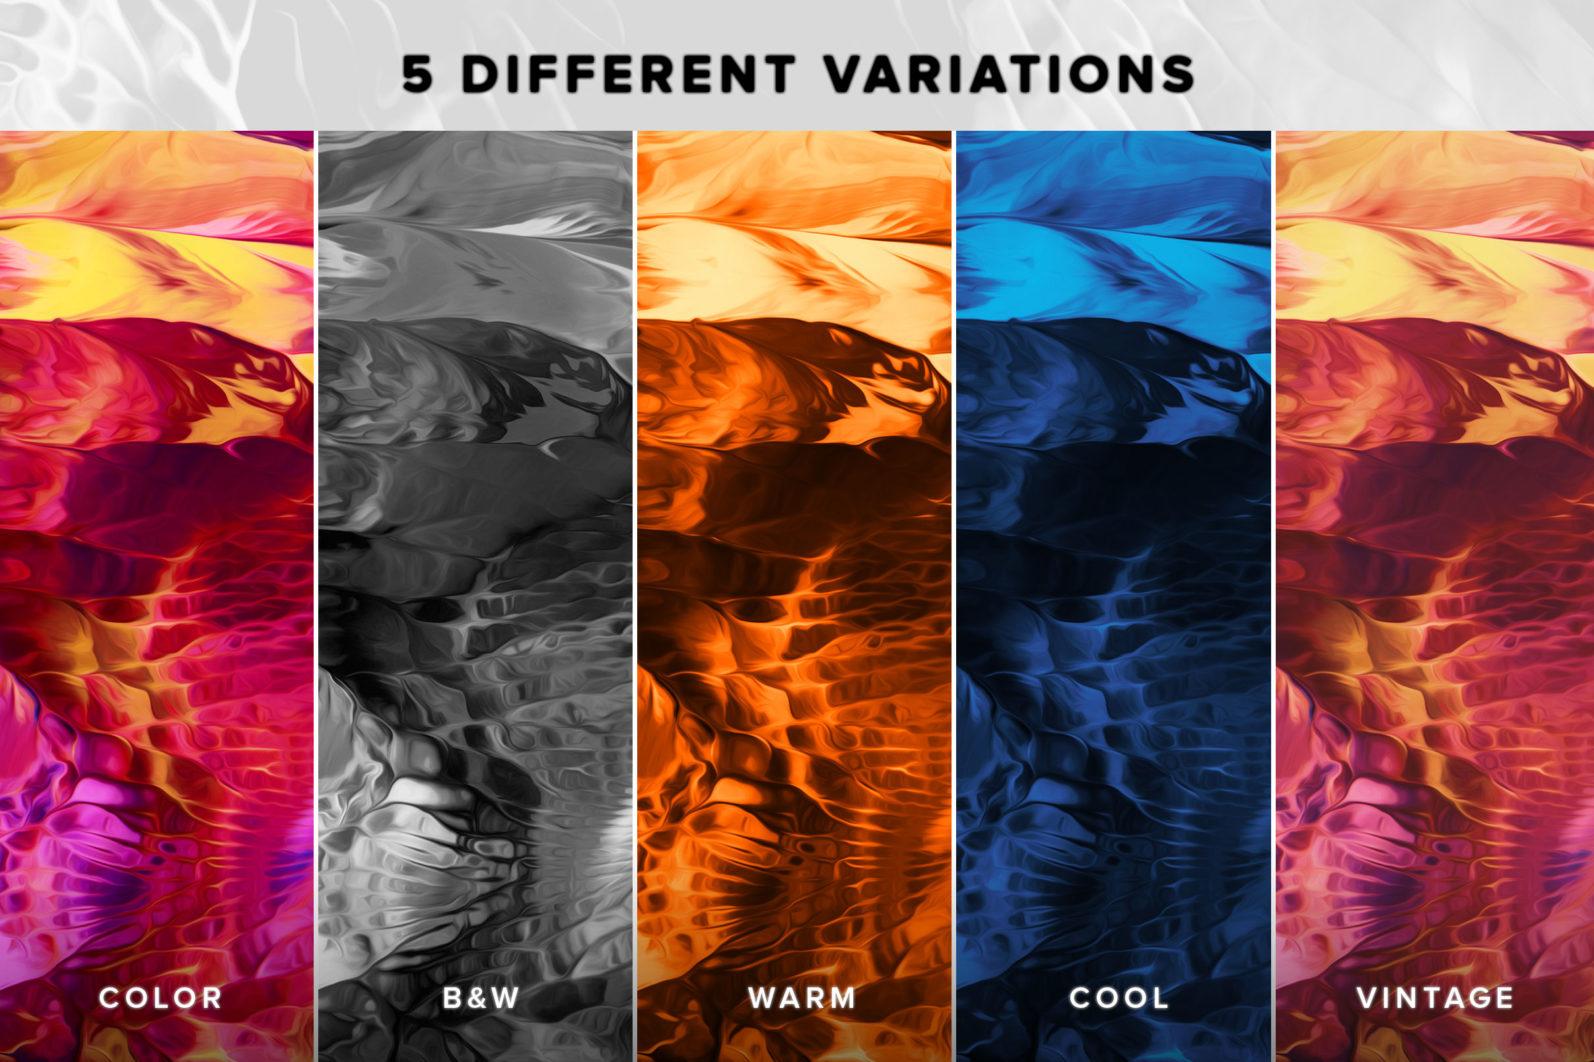 Flow, Vol. 2: 100 Smooth Paint Textures - Flow Vol 2 Preview 04 -